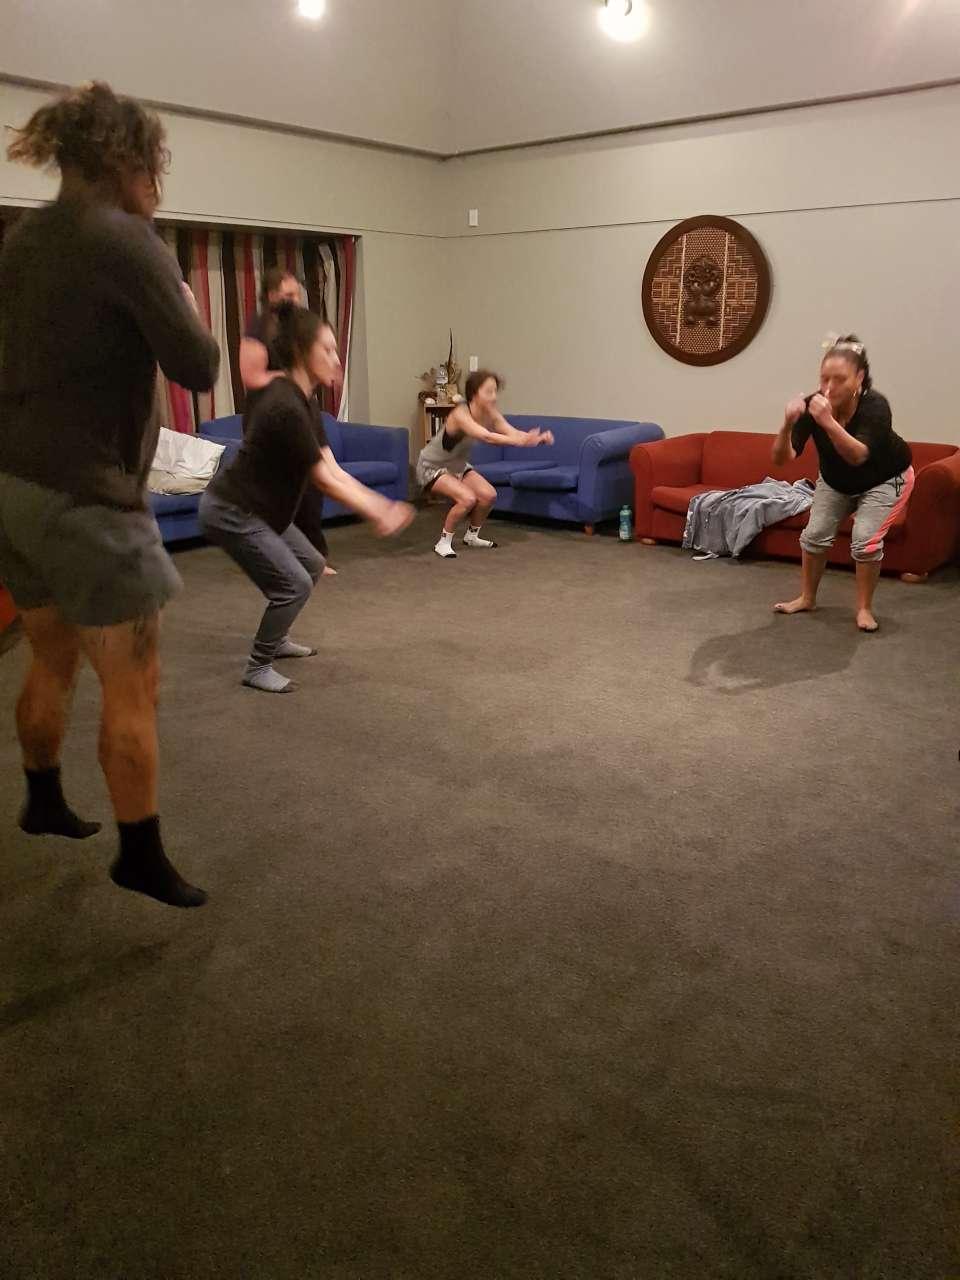 Our MOE Whanau doing their nightly TABATA exercises before bed Wow way to go Whanau awesome